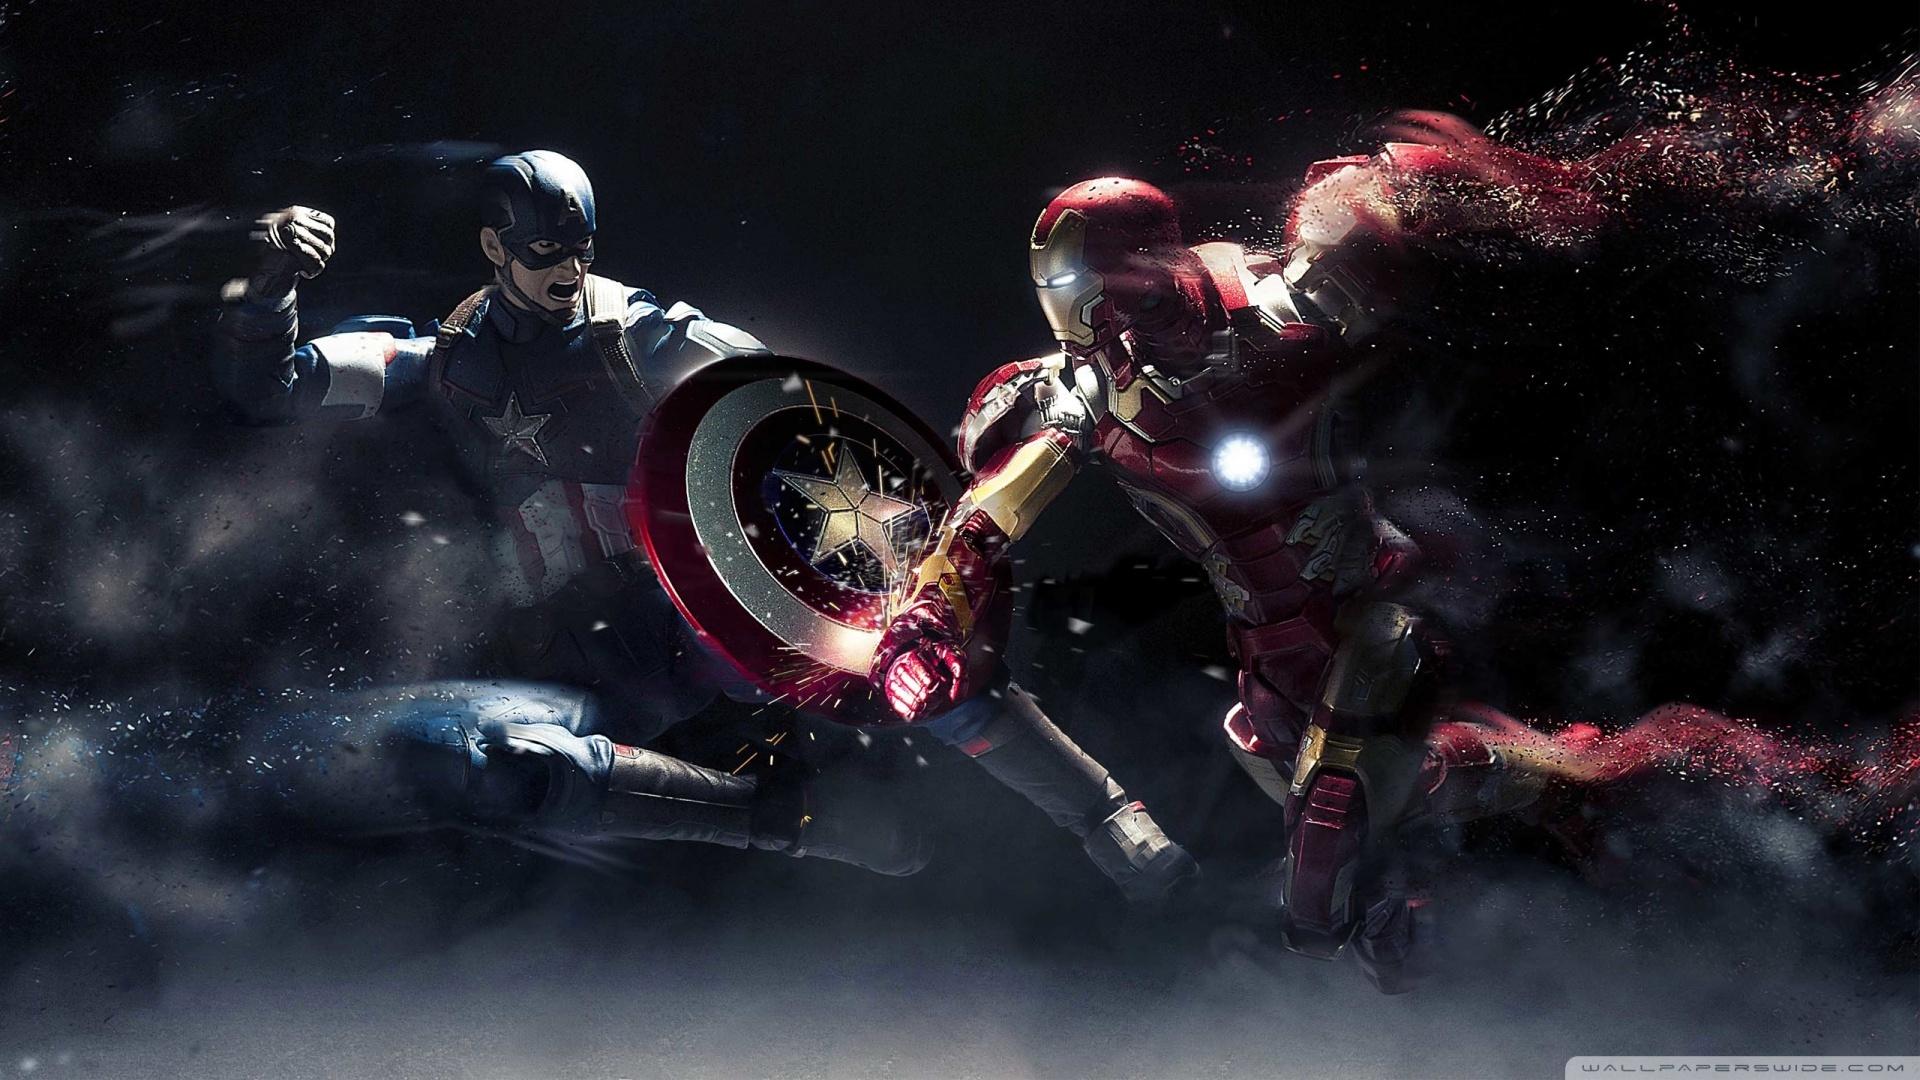 captain america vs iron man 1080p 4k